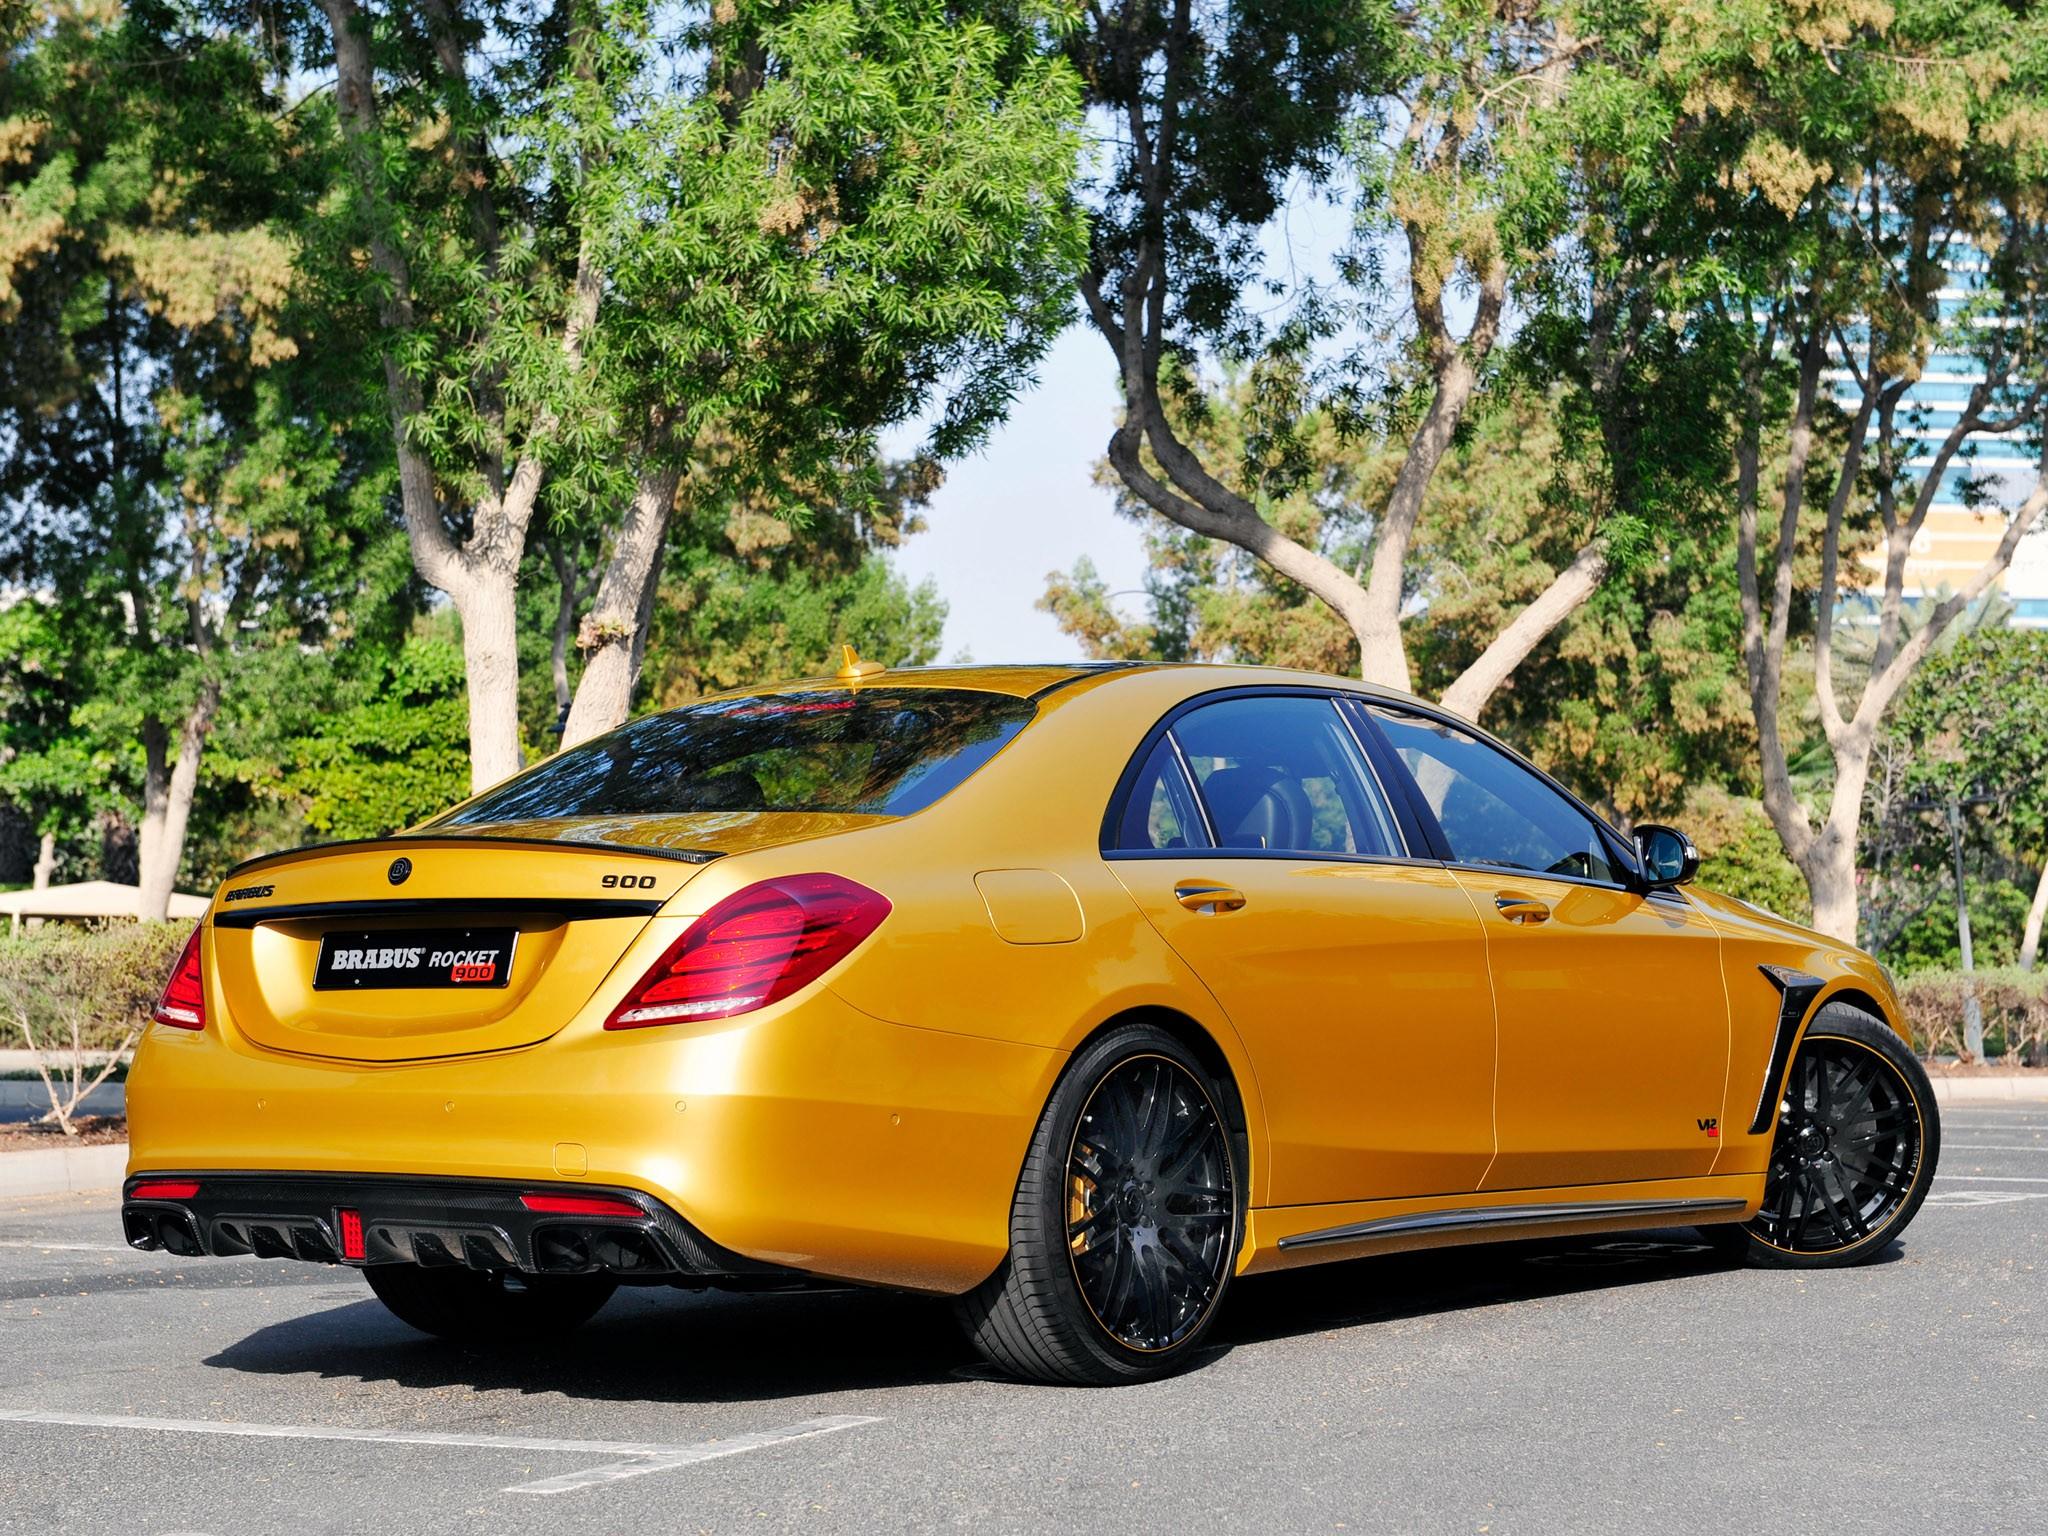 2015 Brabus - Mercedes S Klasse Rocket 900 Desert Gold Edition W222